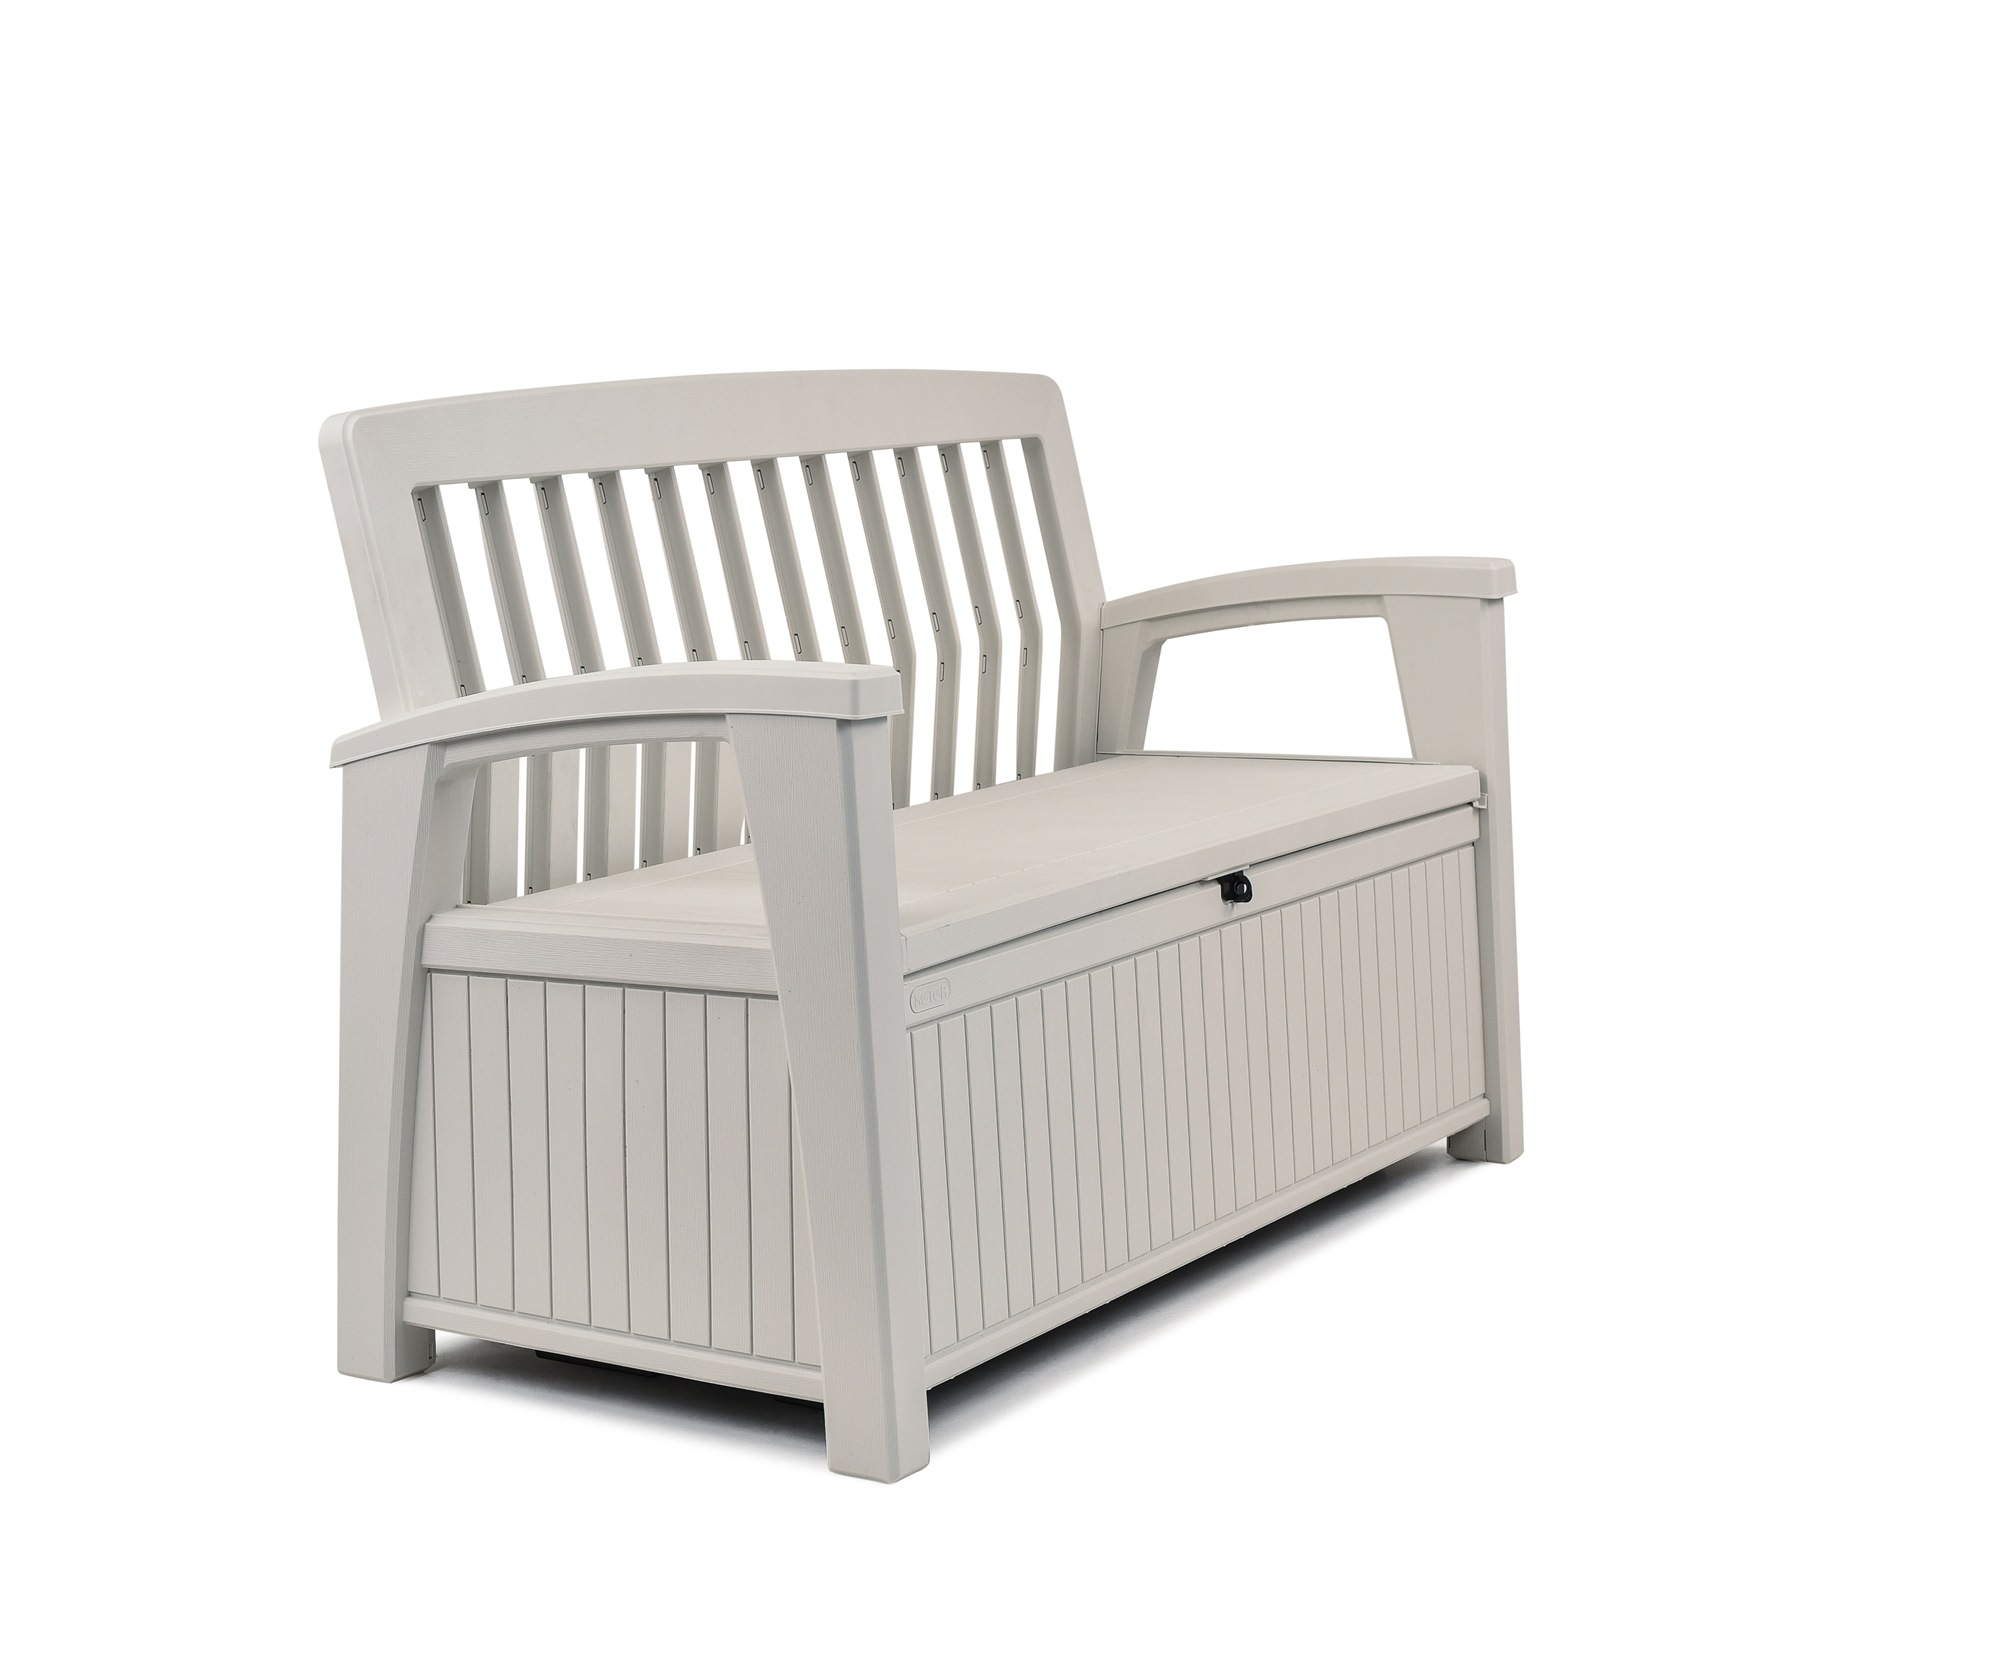 keter 60 gallon storage bench resin outdoor storage furniture seats 2 white